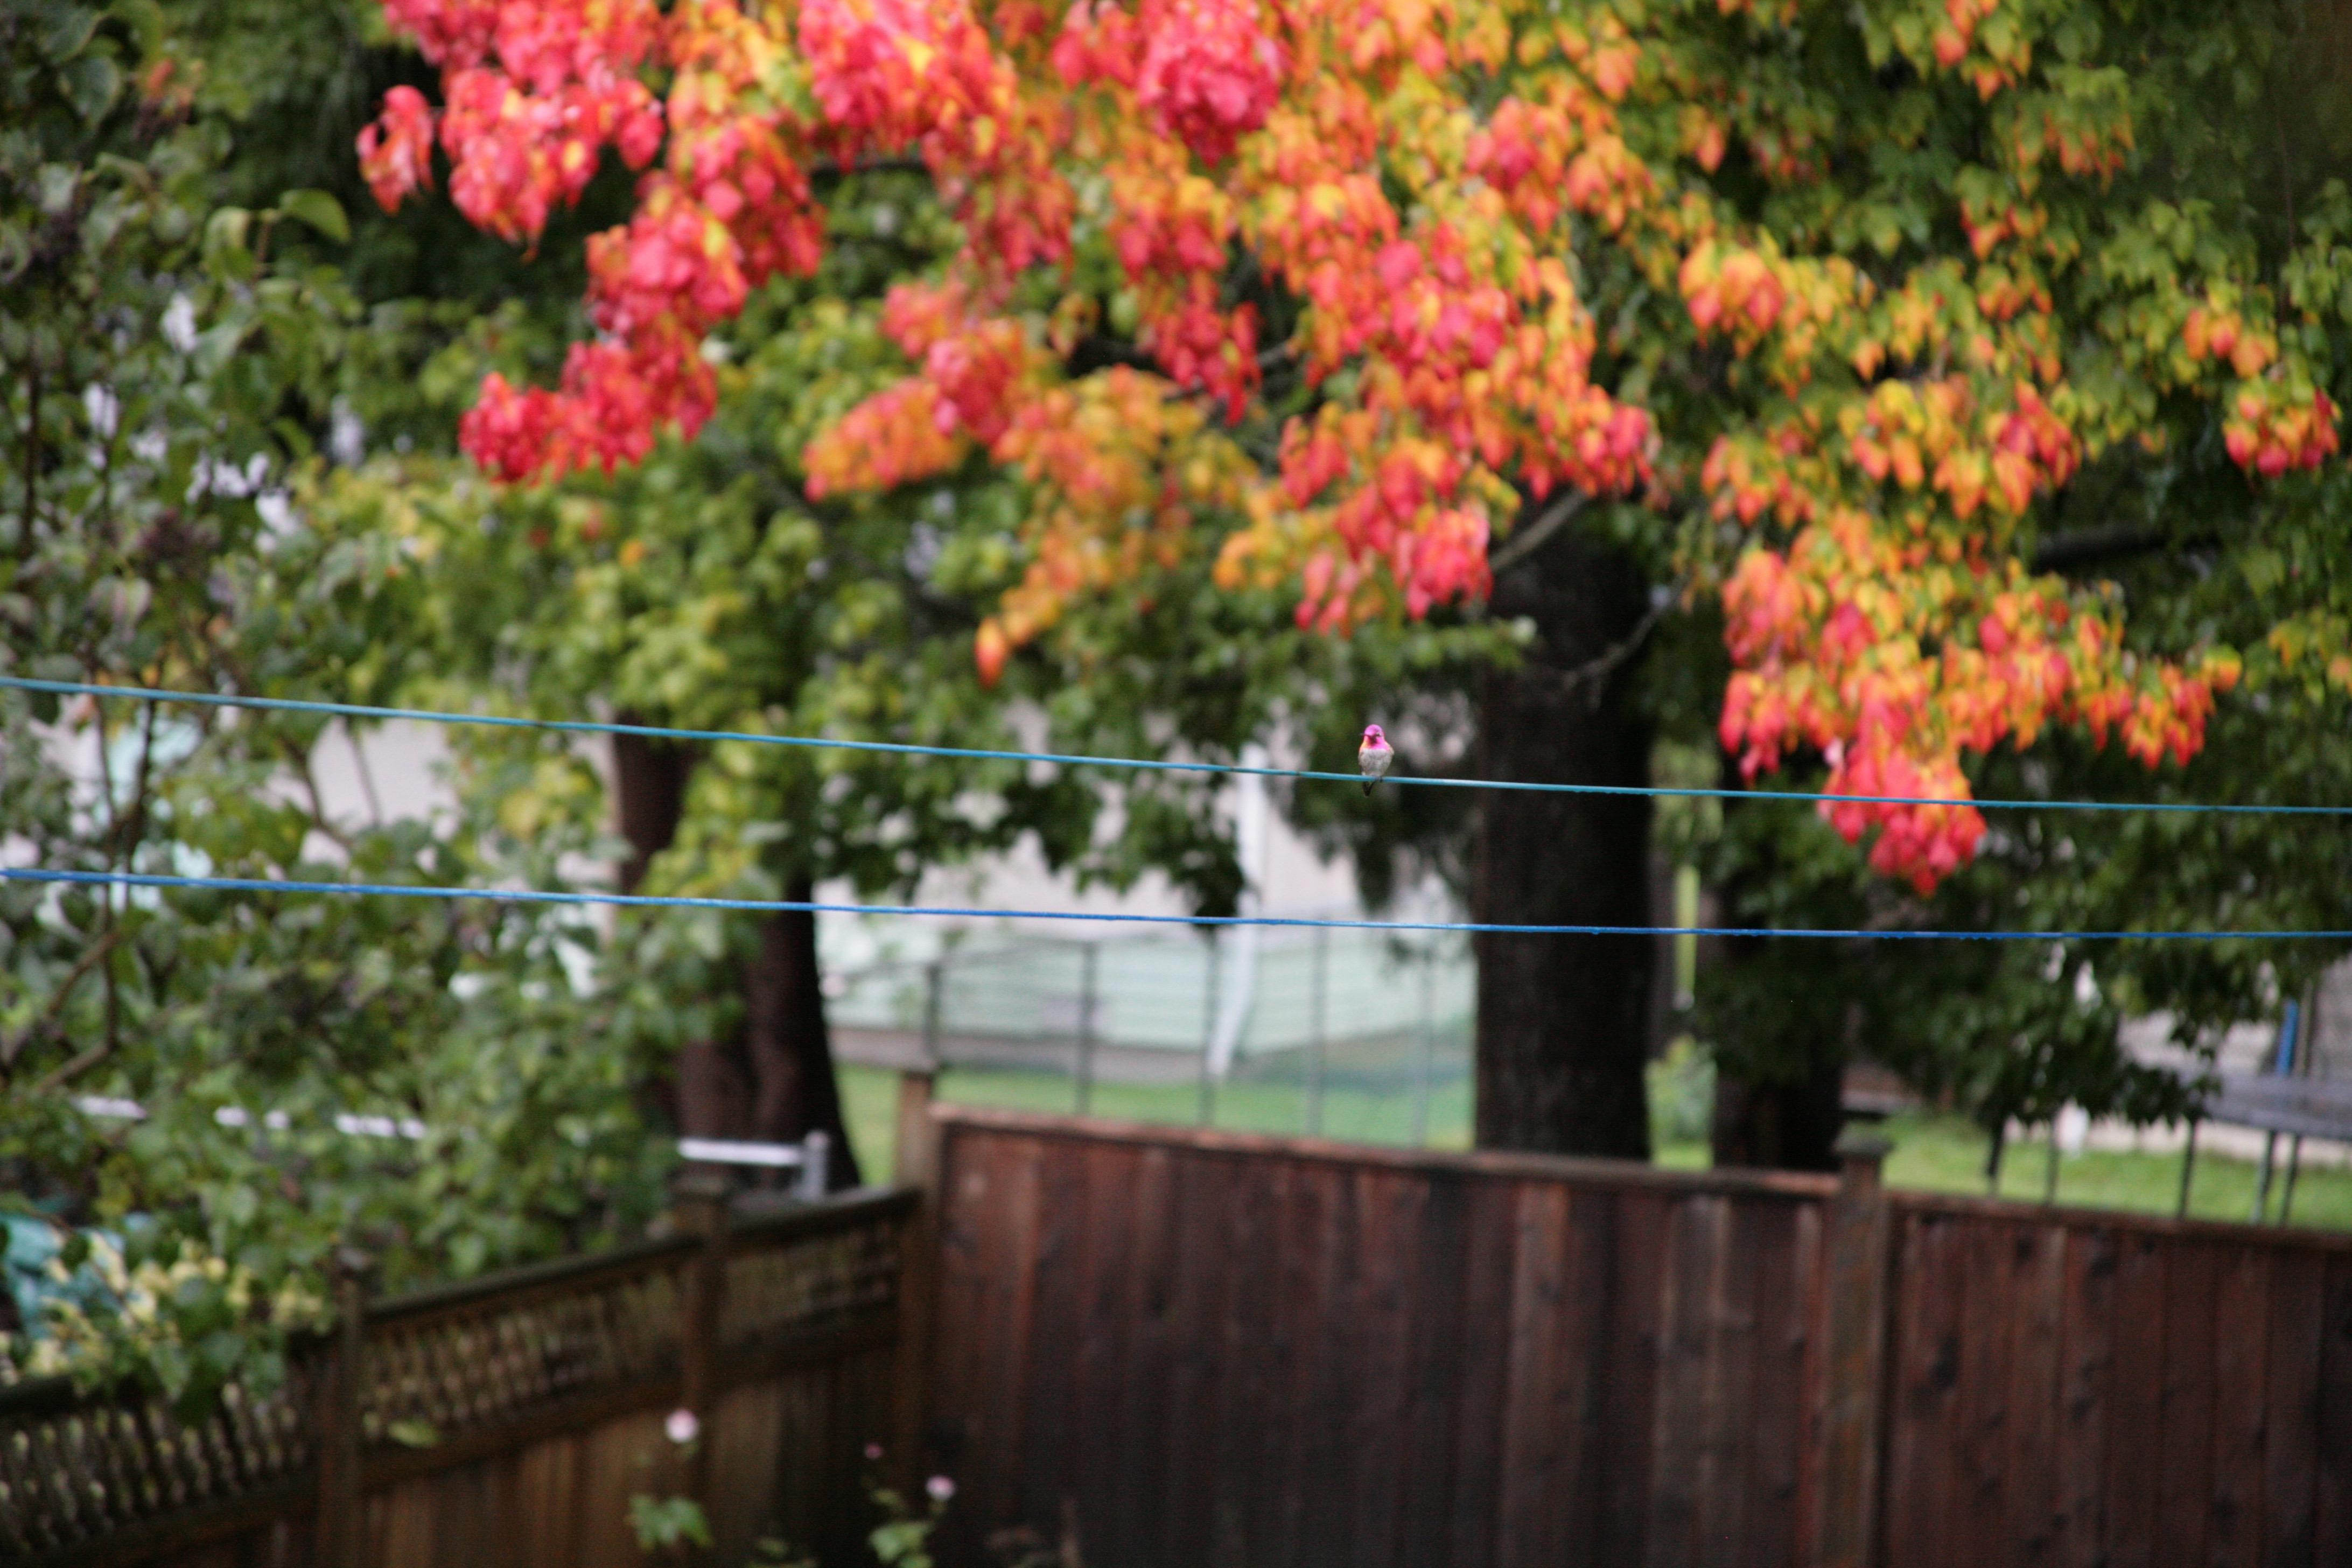 Free images tree leaf fall flower orange green red free images tree leaf fall flower orange green red colourful autumn backyard hummingbird botany yellow garden pink season clothesline mightylinksfo